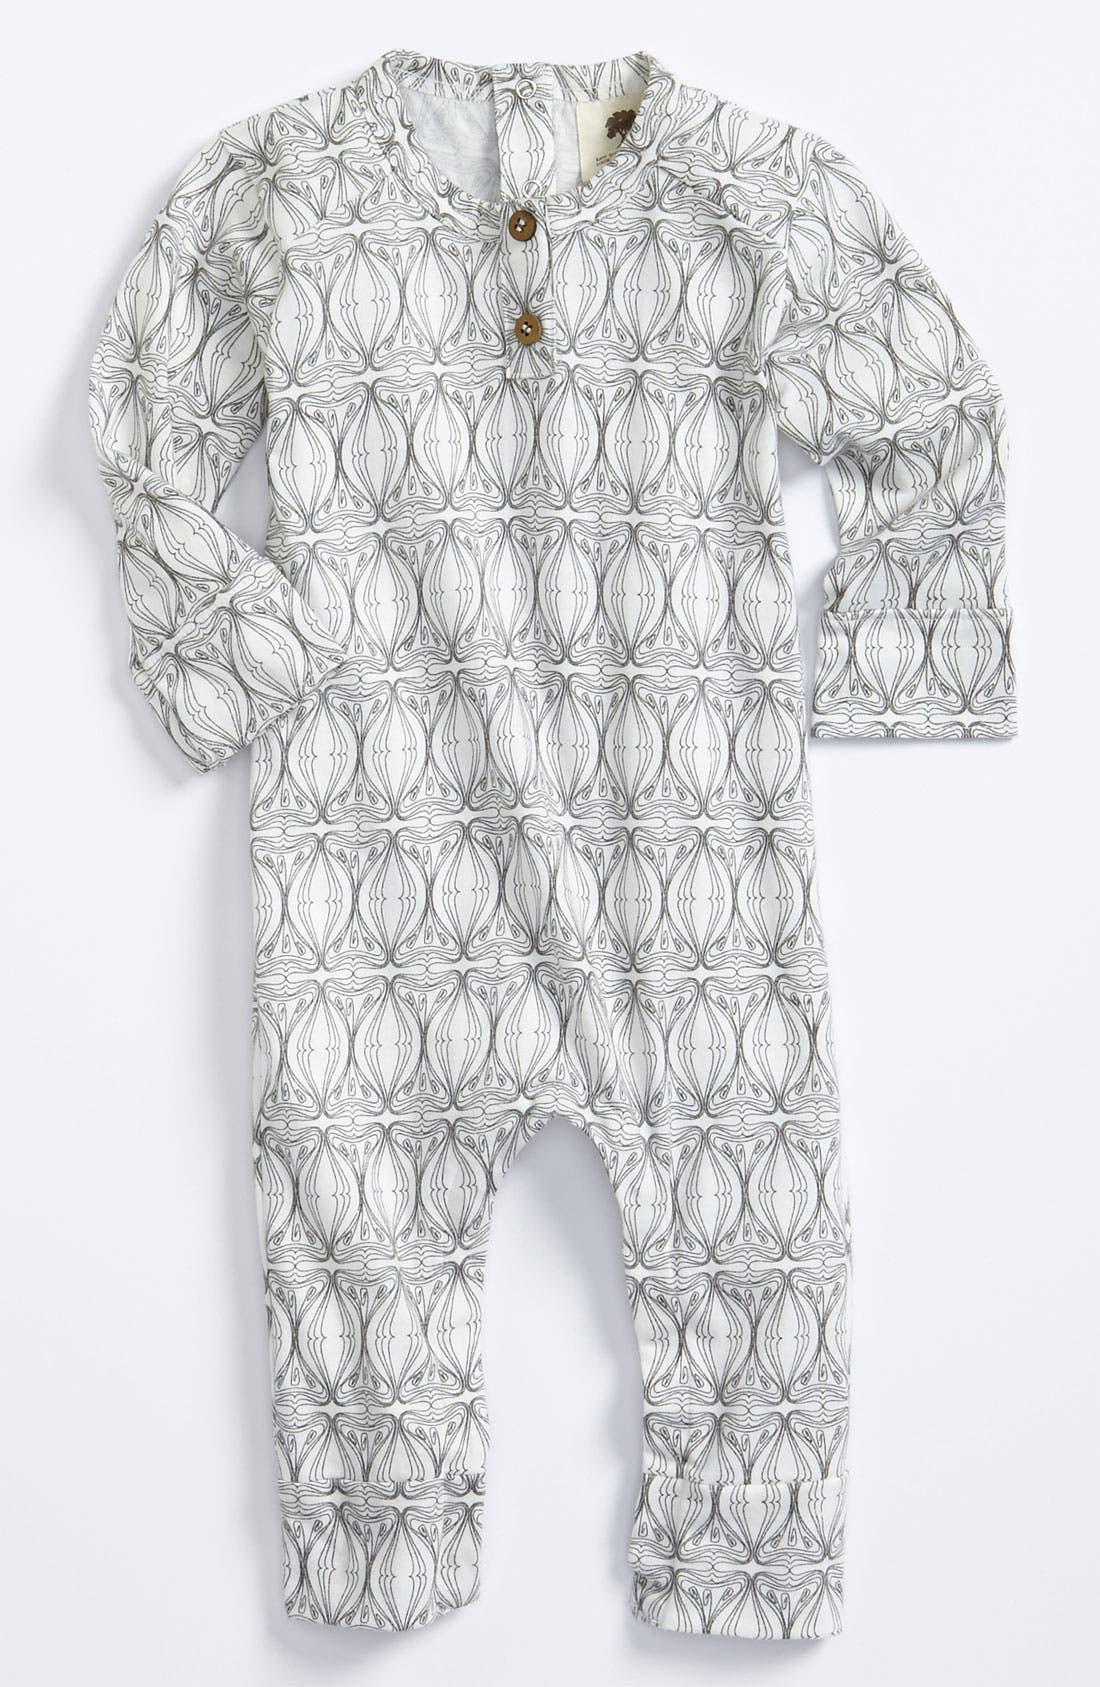 Alternate Image 1 Selected - Kate Quinn Organics Print Romper (Infant)